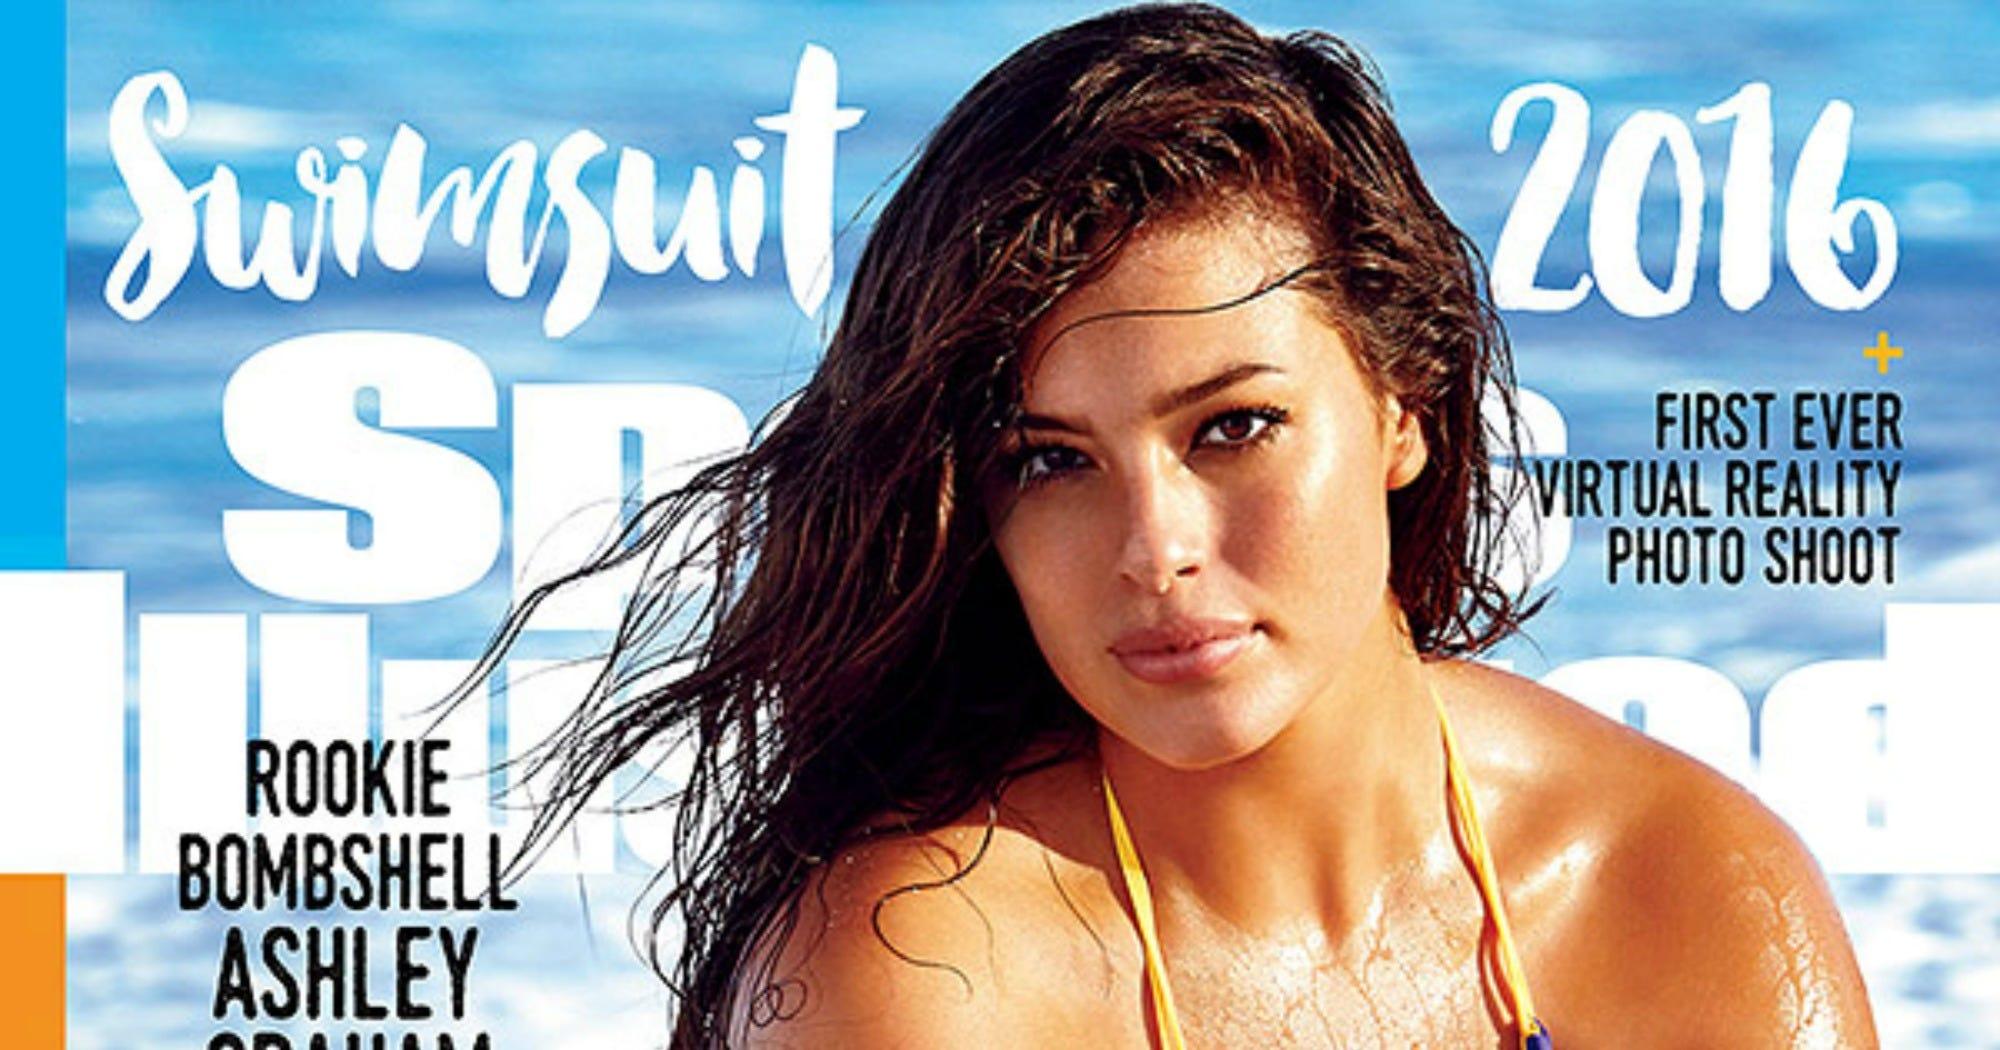 Ashley Graham Plus Size Model Sports Illustrated Cover